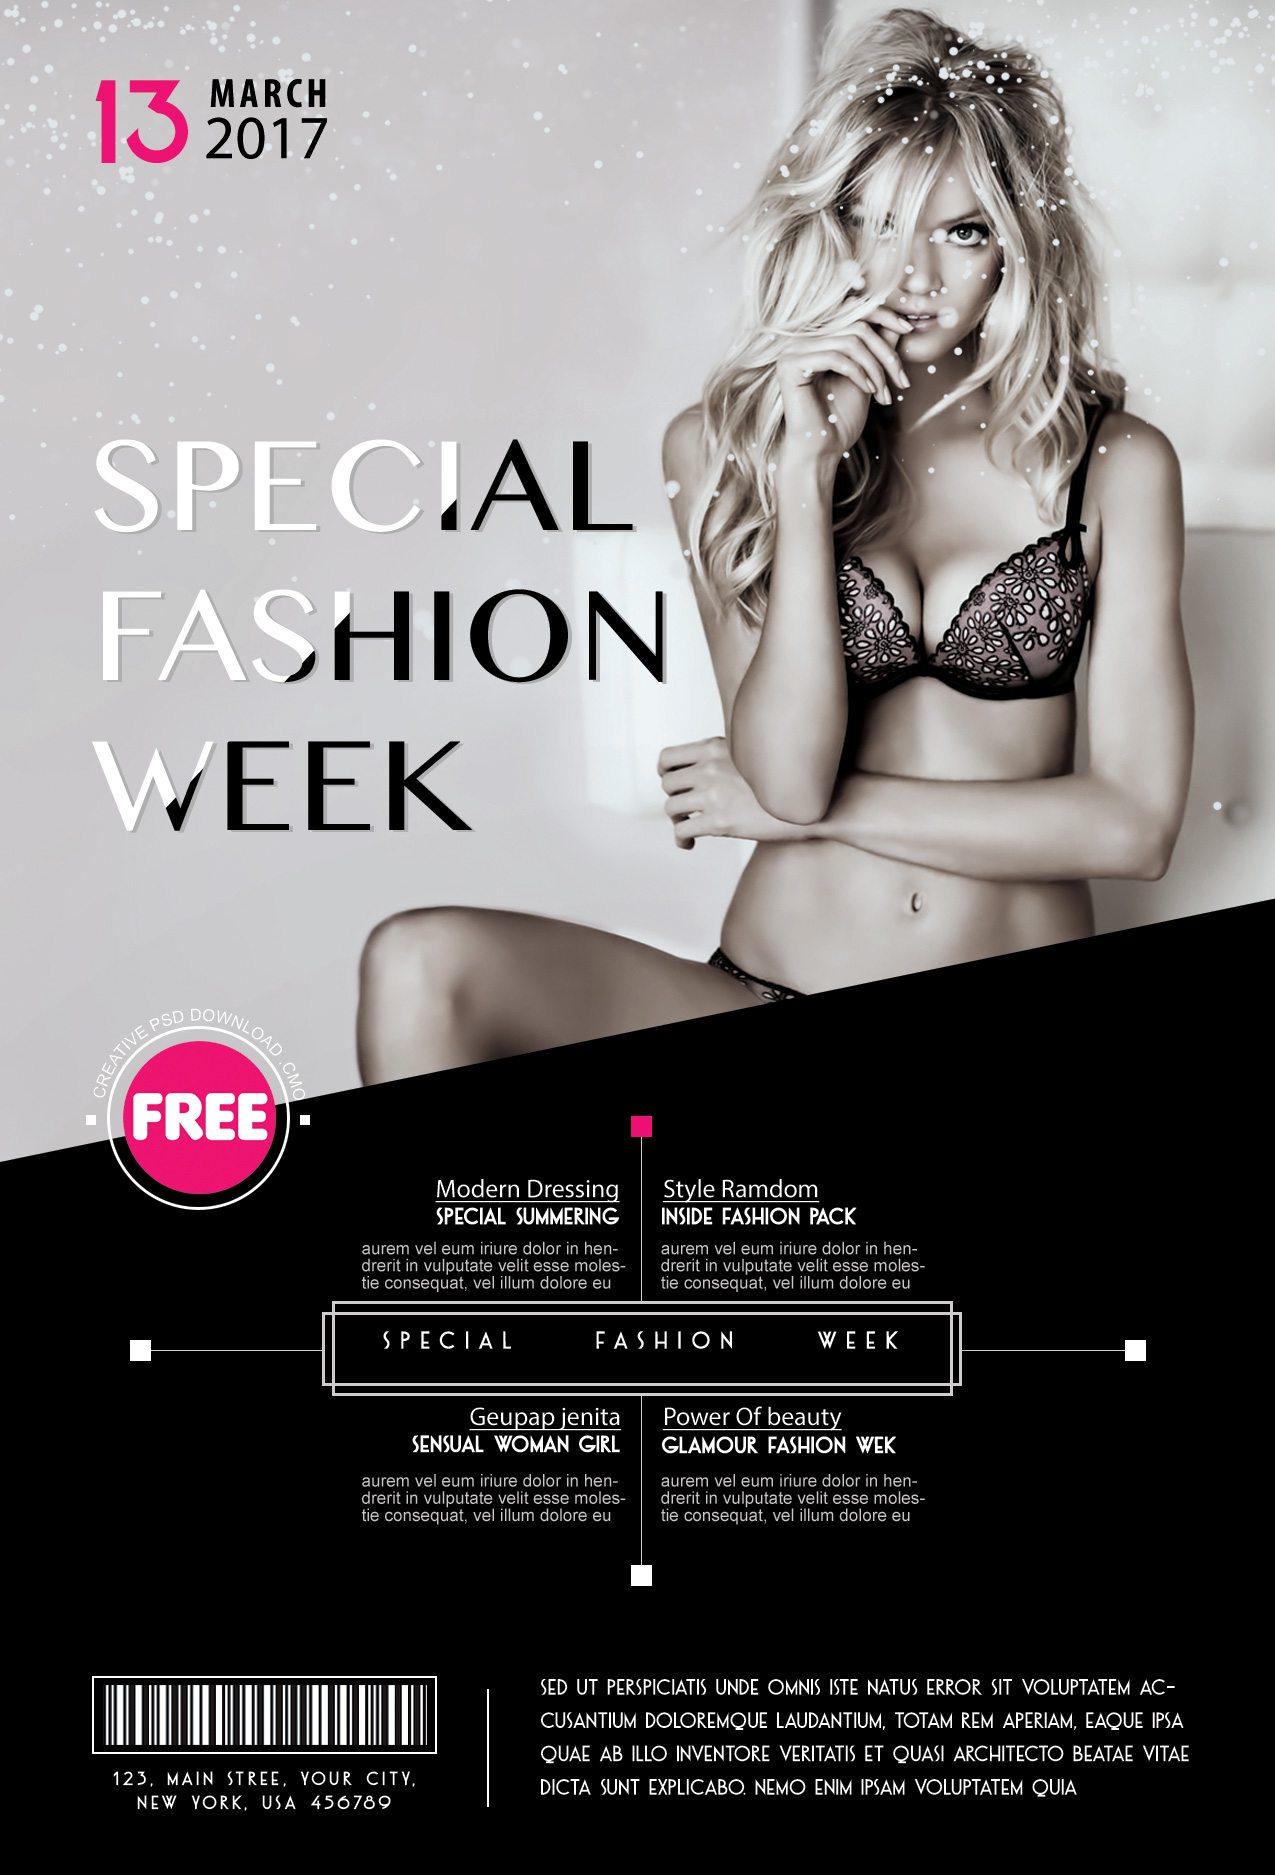 Special fashion week flyer 2